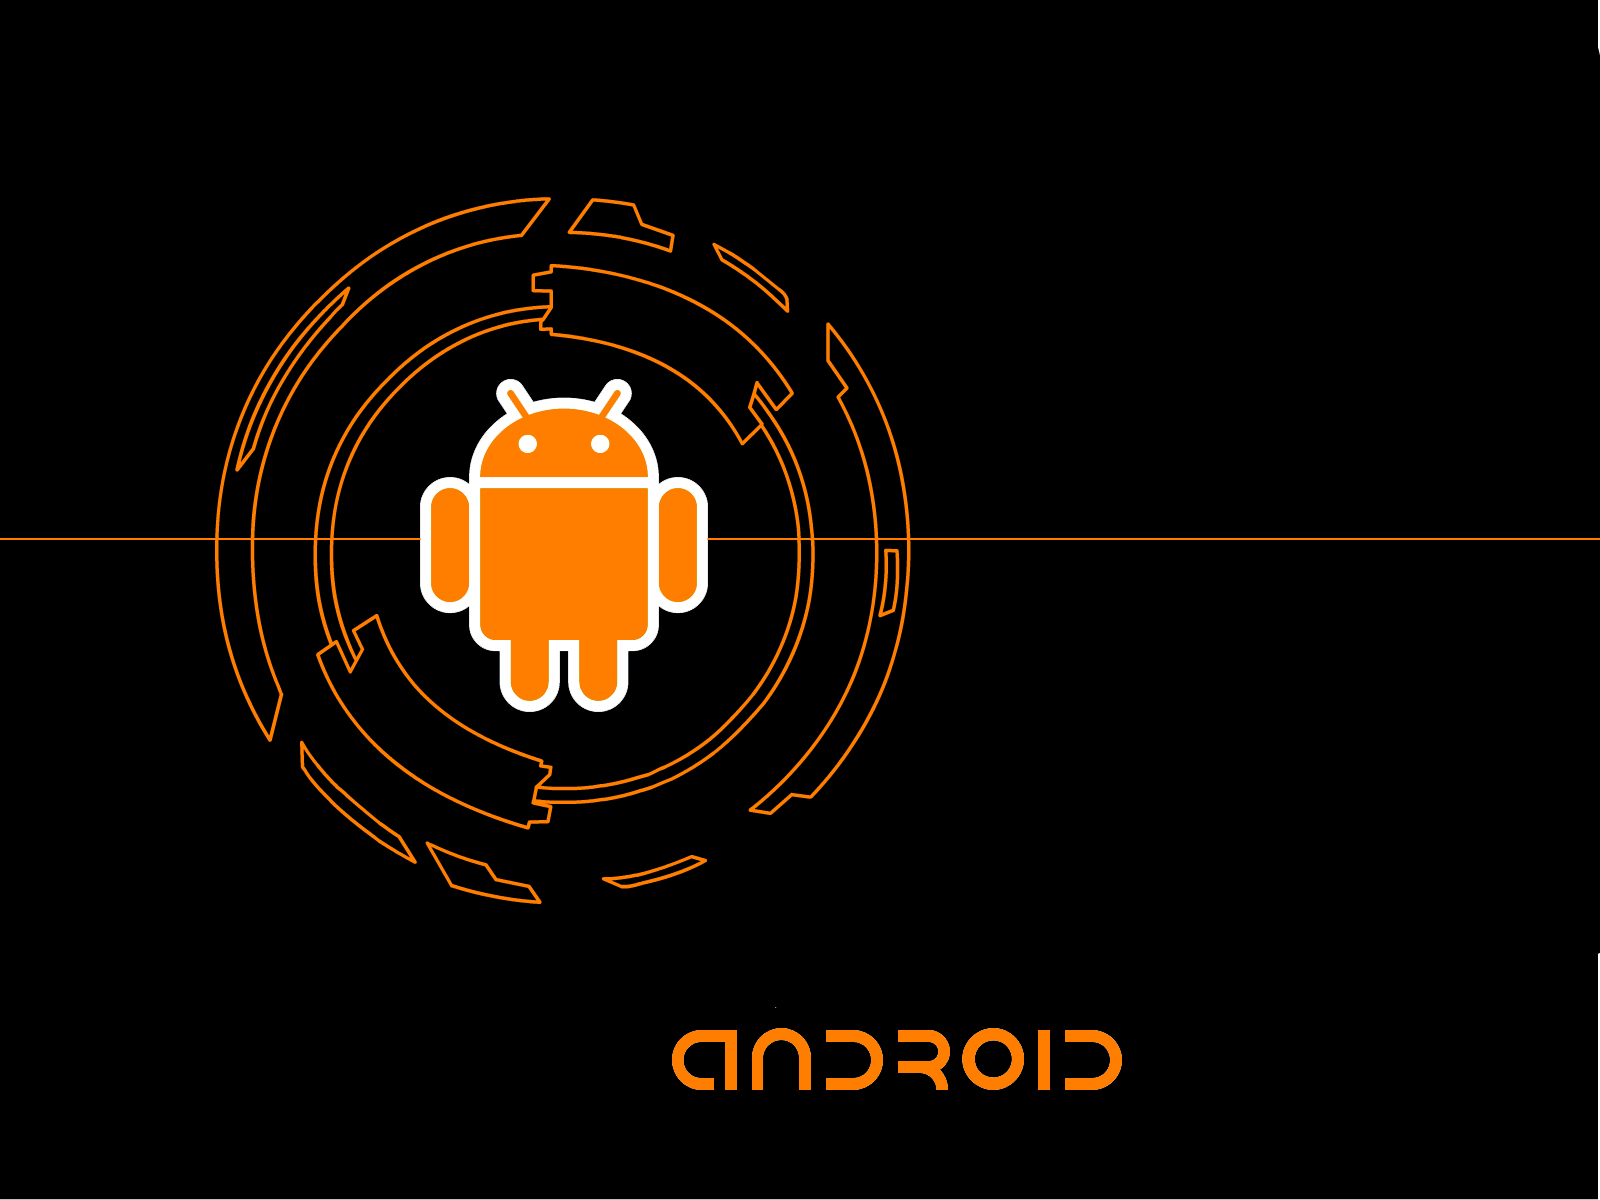 Wallpaper downloader app for android - Wallpaper Download Android Android Wallpapers Free Download Android Wallpapers For Pc Desktop